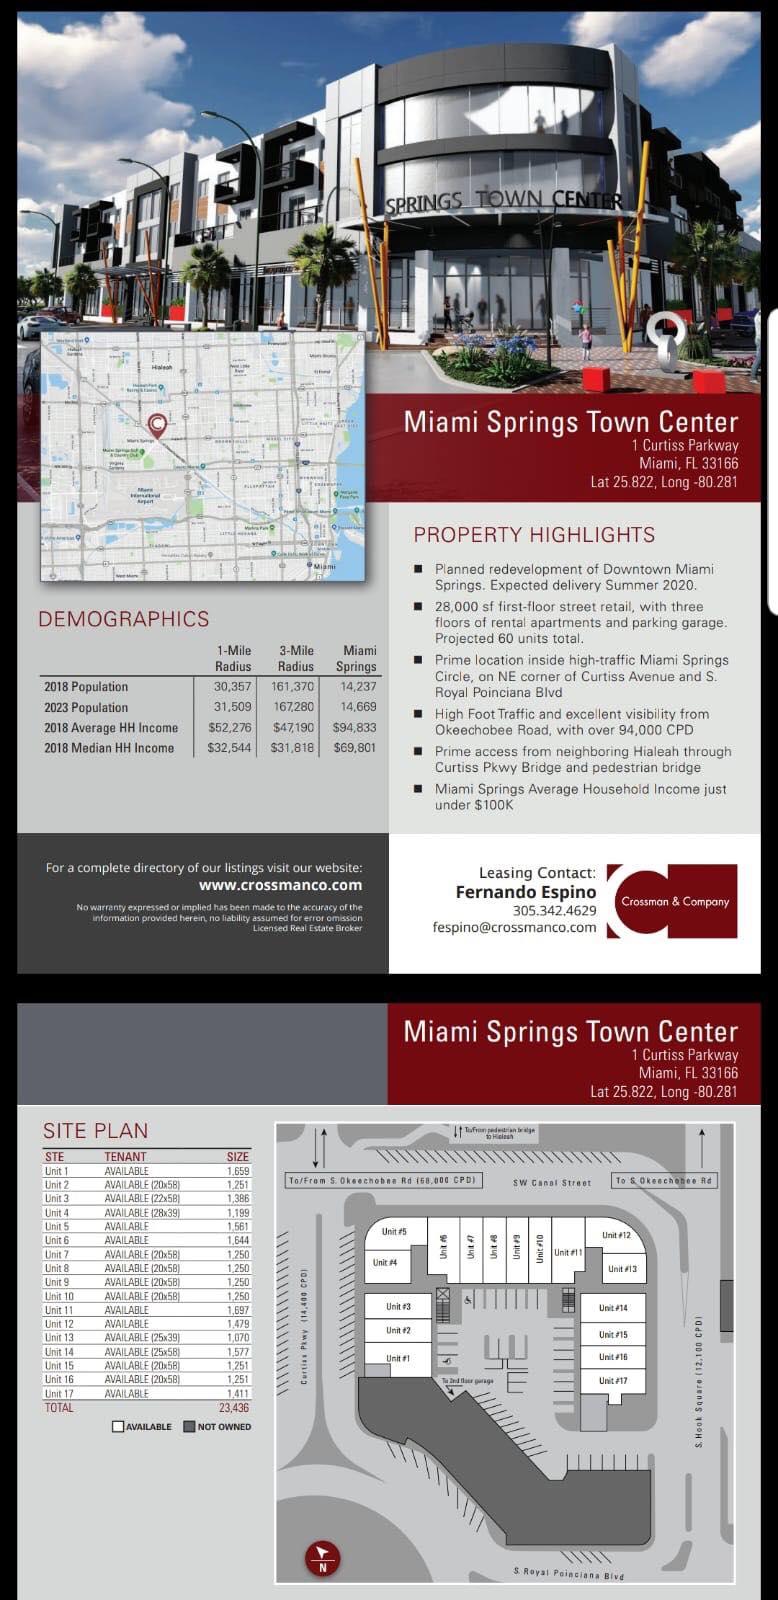 Miami Springs Town Center Flyer